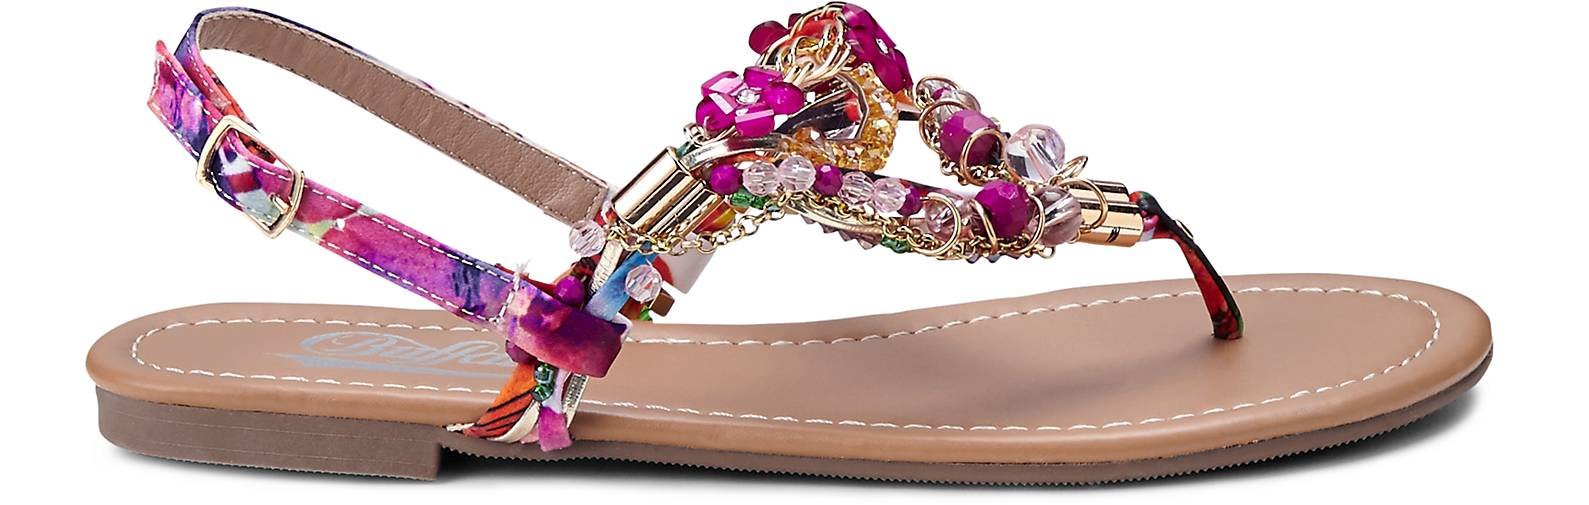 Buffalo Fashion-Dianette